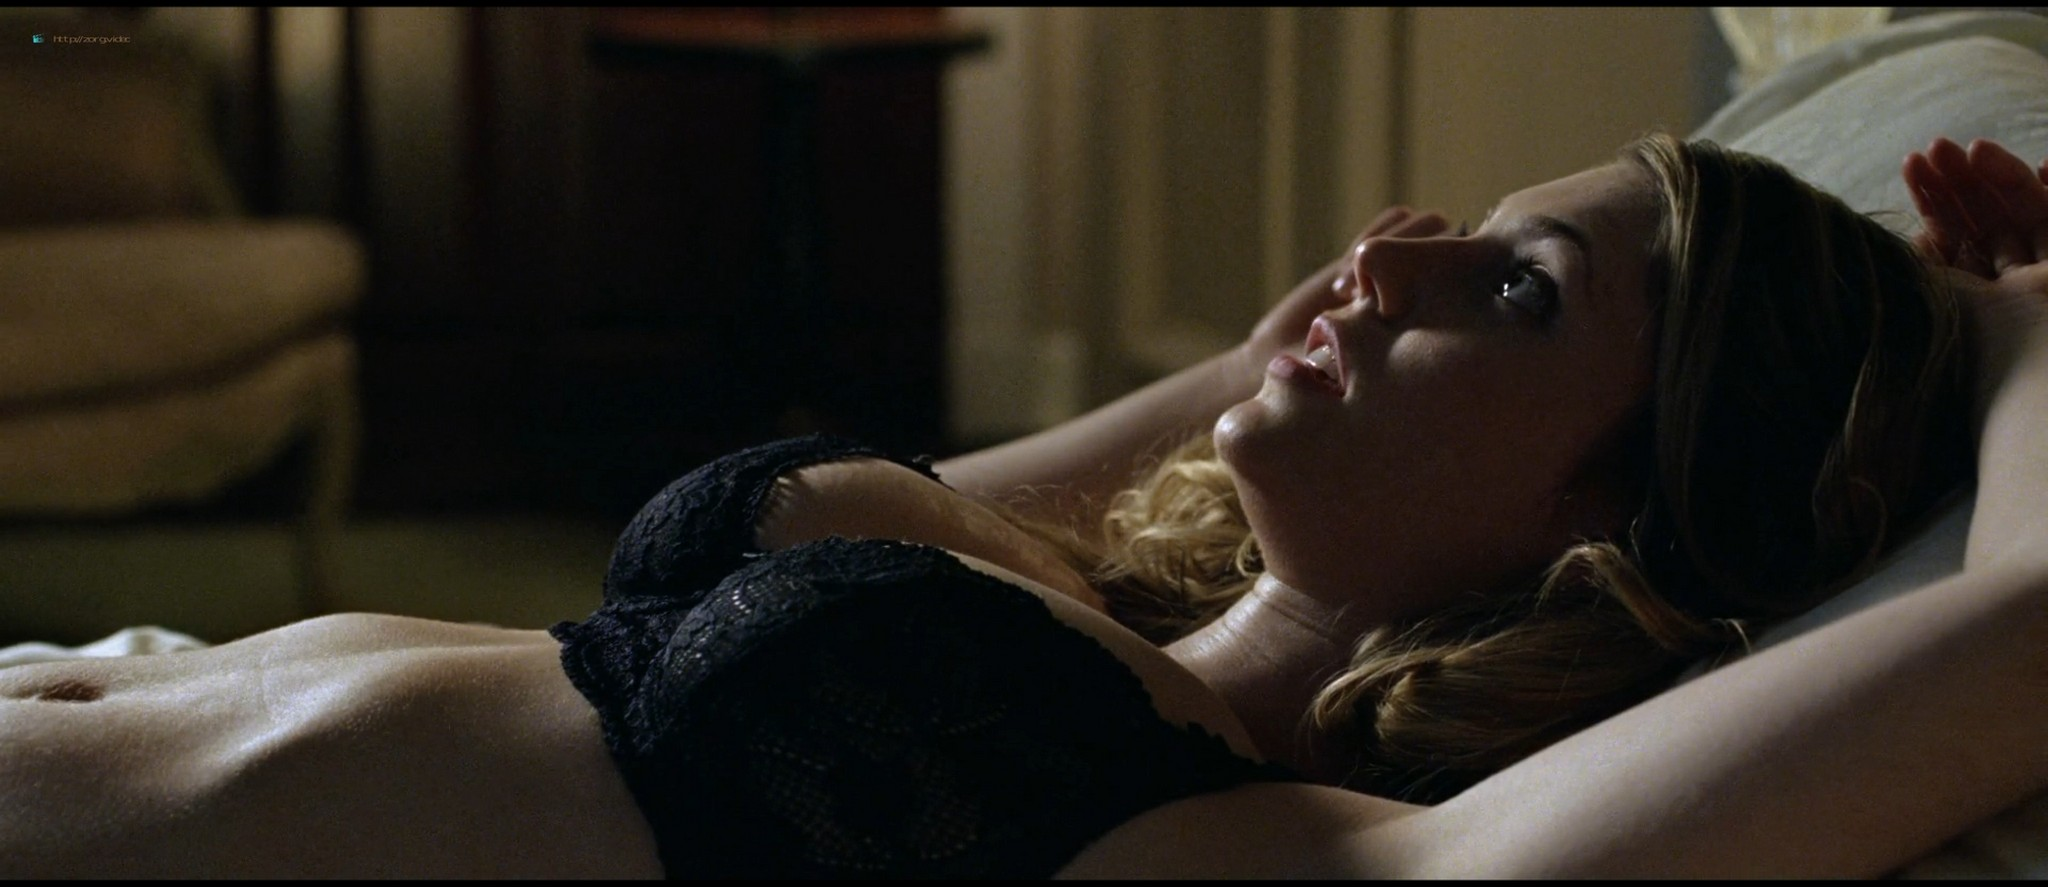 Diora Baird nude topless huge boobs others nude too - Wedding Crashers (2005) HD 1080p BluRay (1)